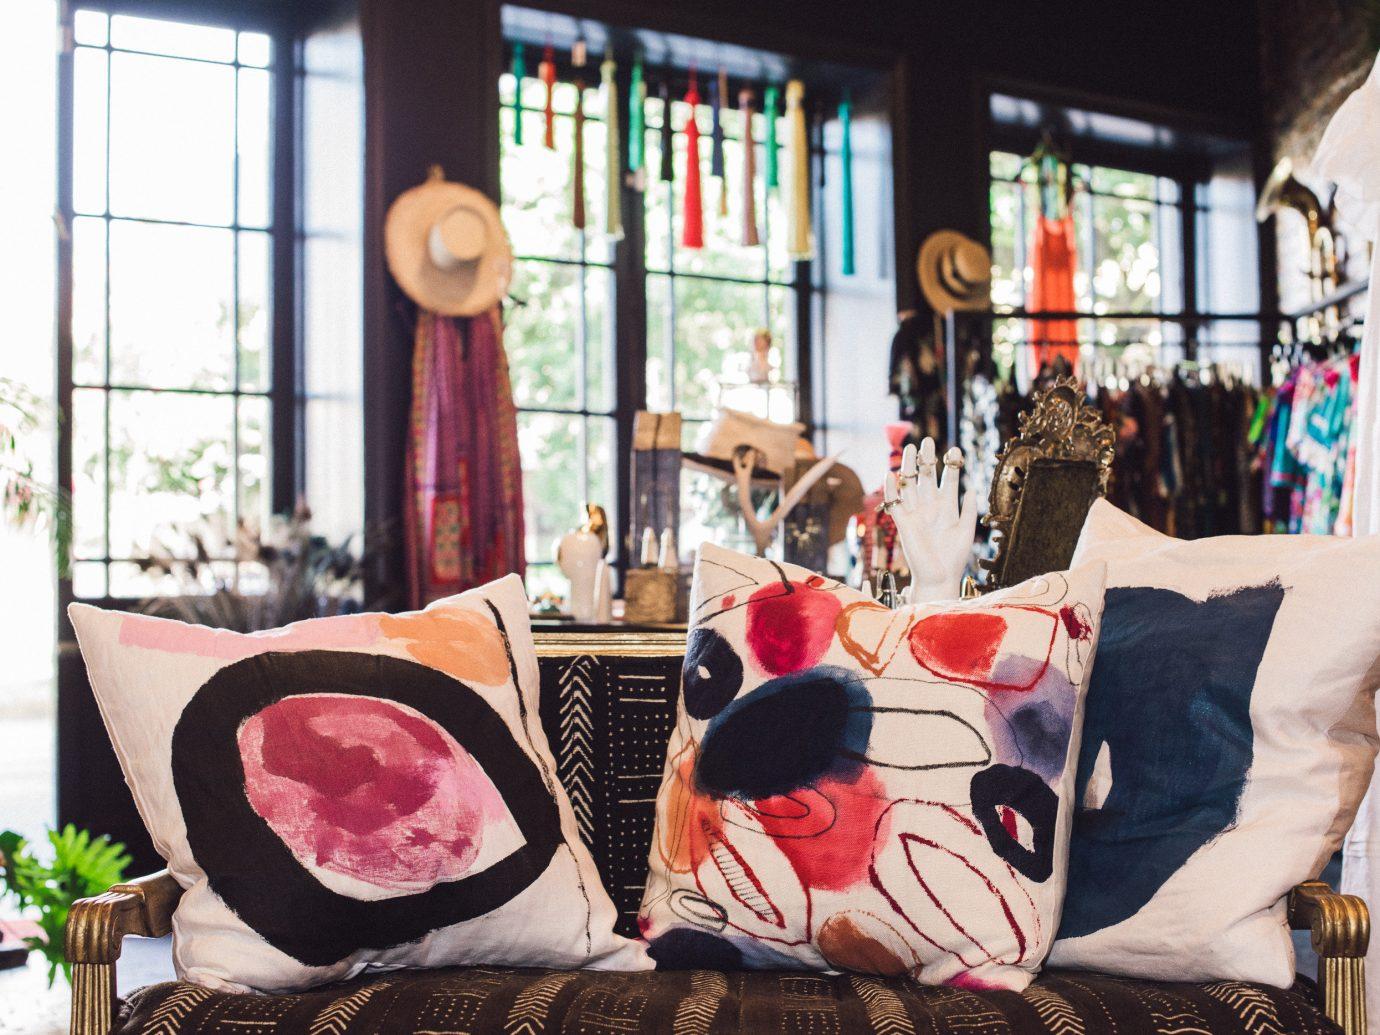 Girls Getaways New Orleans Trip Ideas Weekend Getaways indoor room furniture textile home interior design product window house